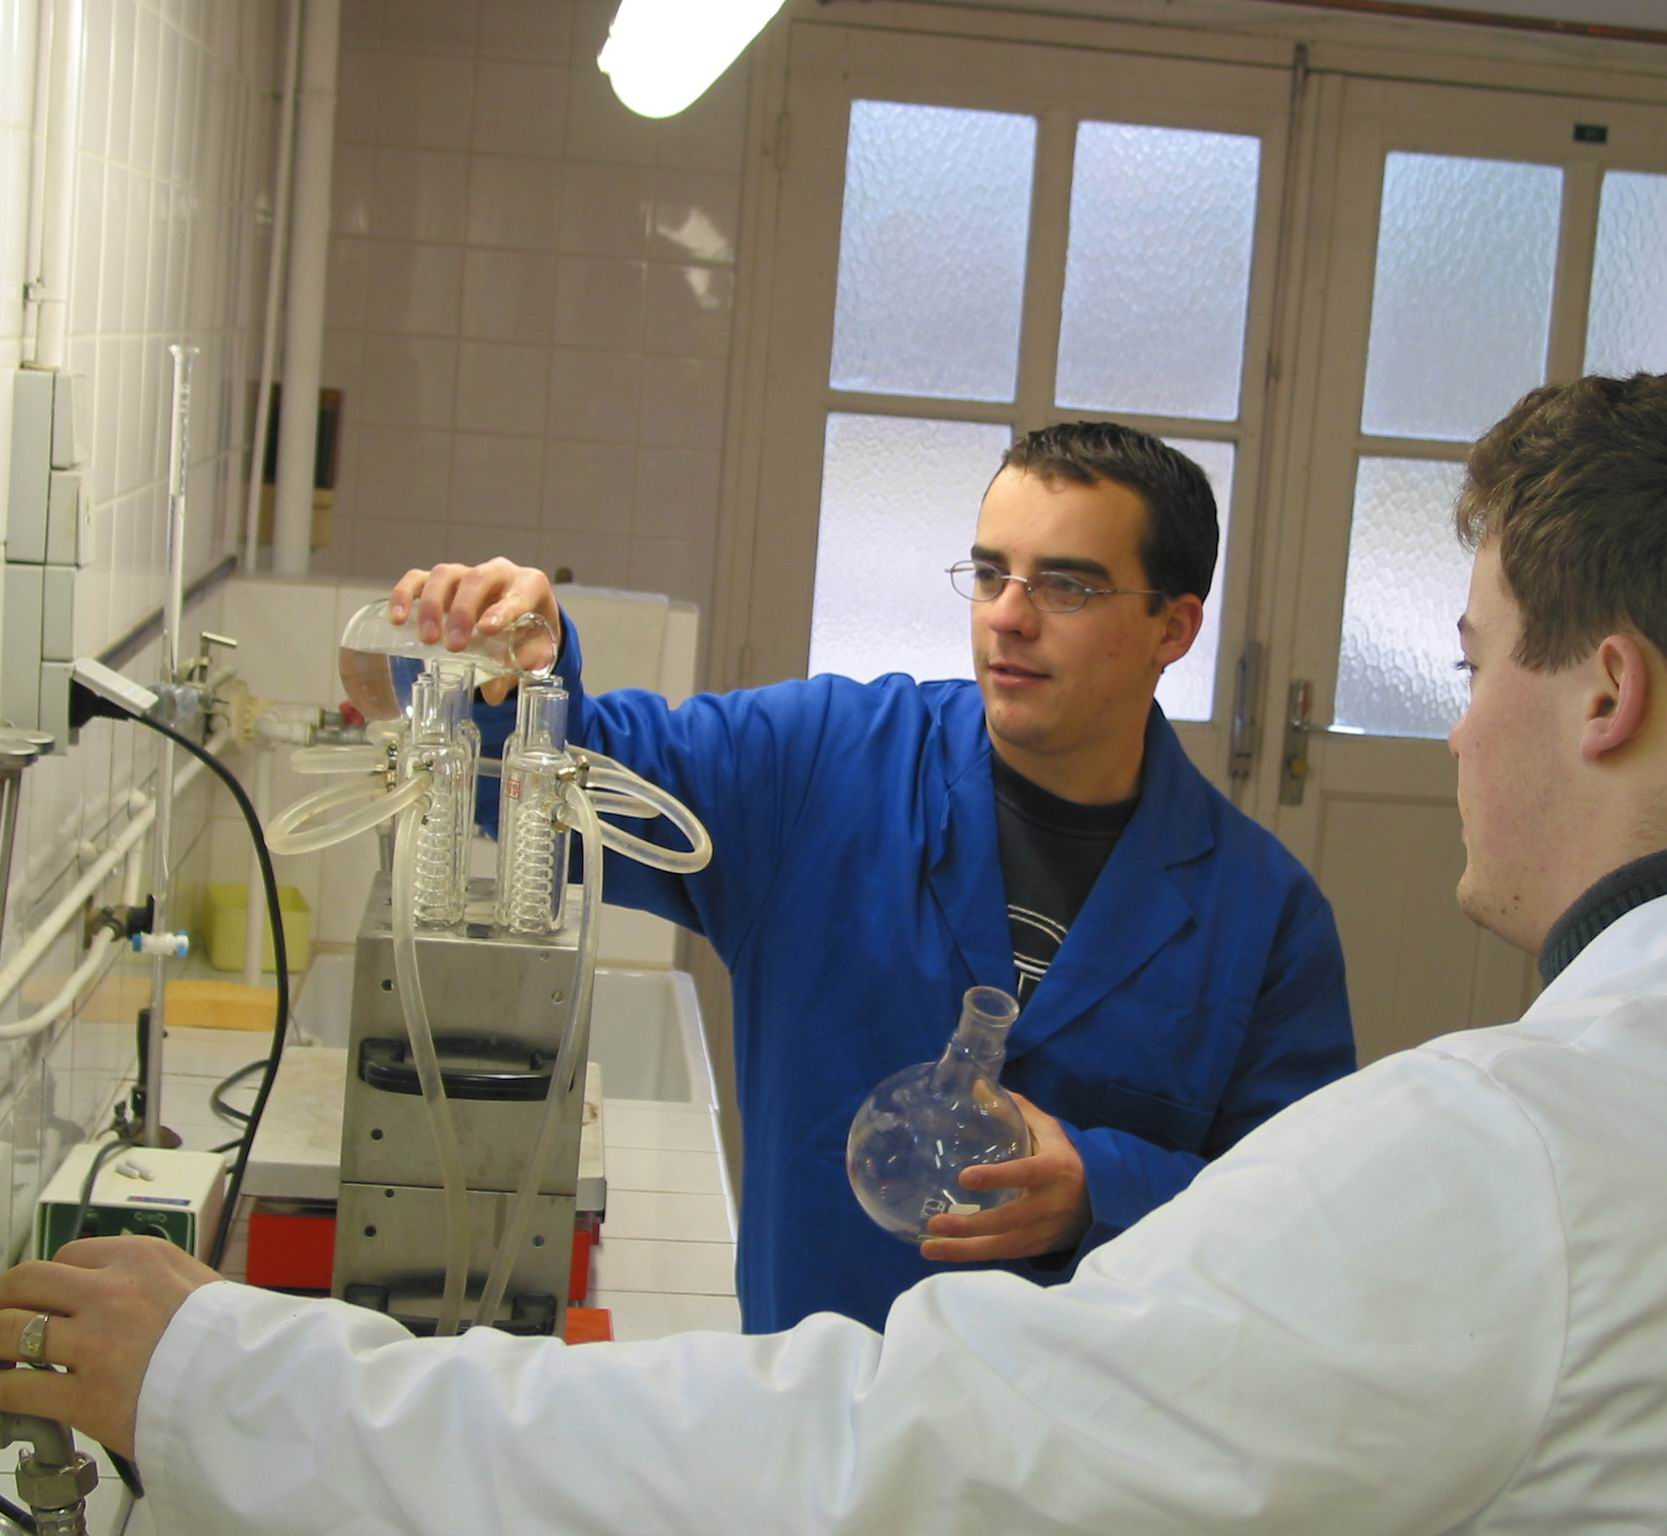 jeunes analyse Laboratoire